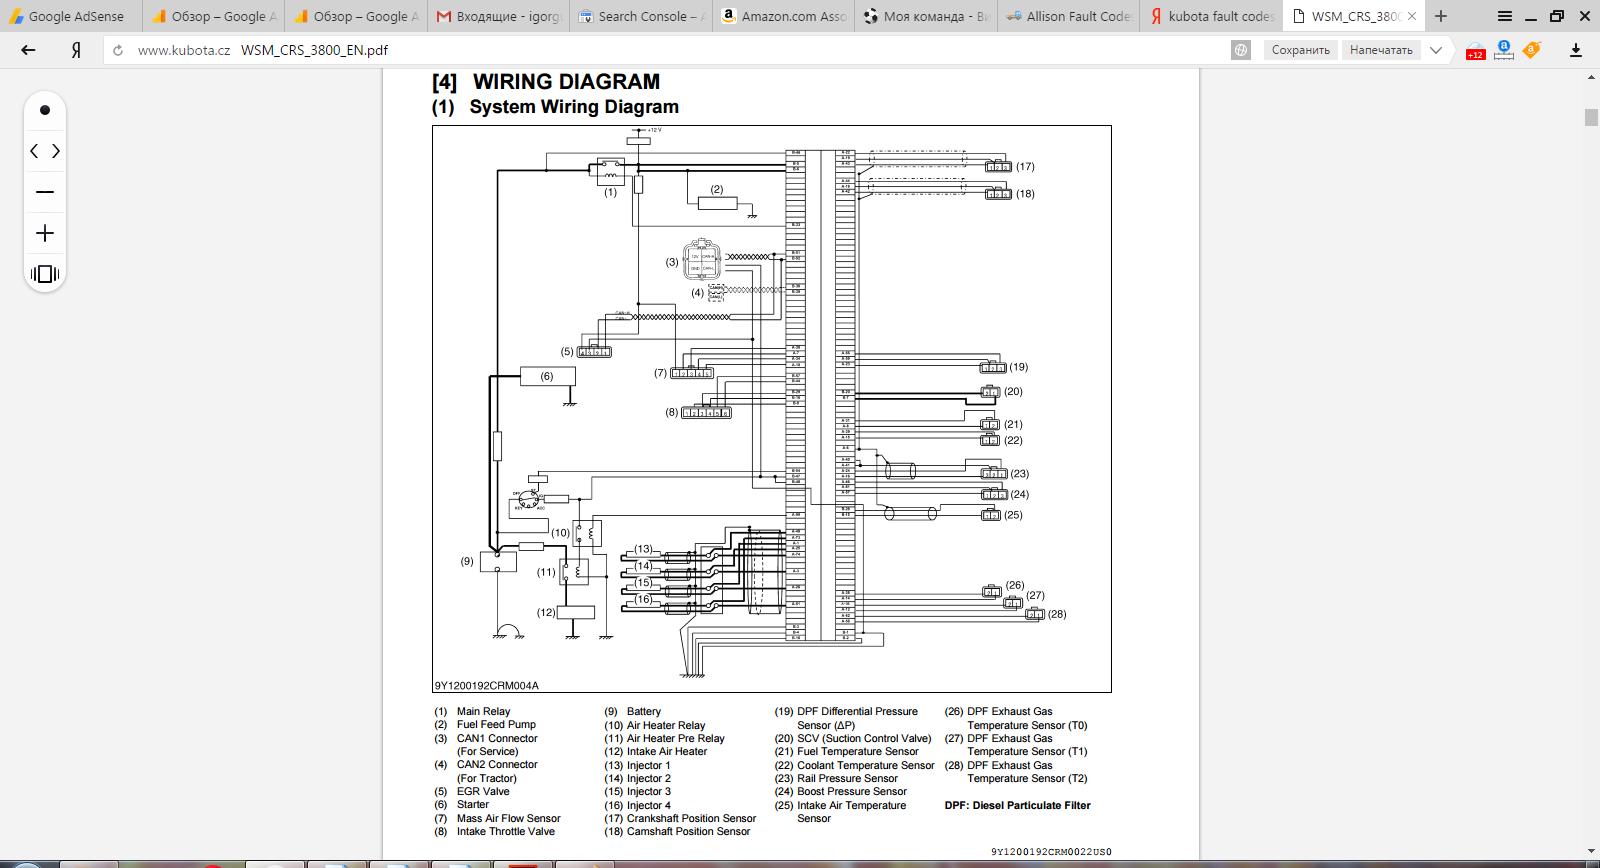 Kubota+V3600+Wiring+Diagram?t\=1495350576 kubota wiring diagram pdf kubota wiring diagram pdf 3200b \u2022 free  at panicattacktreatment.co